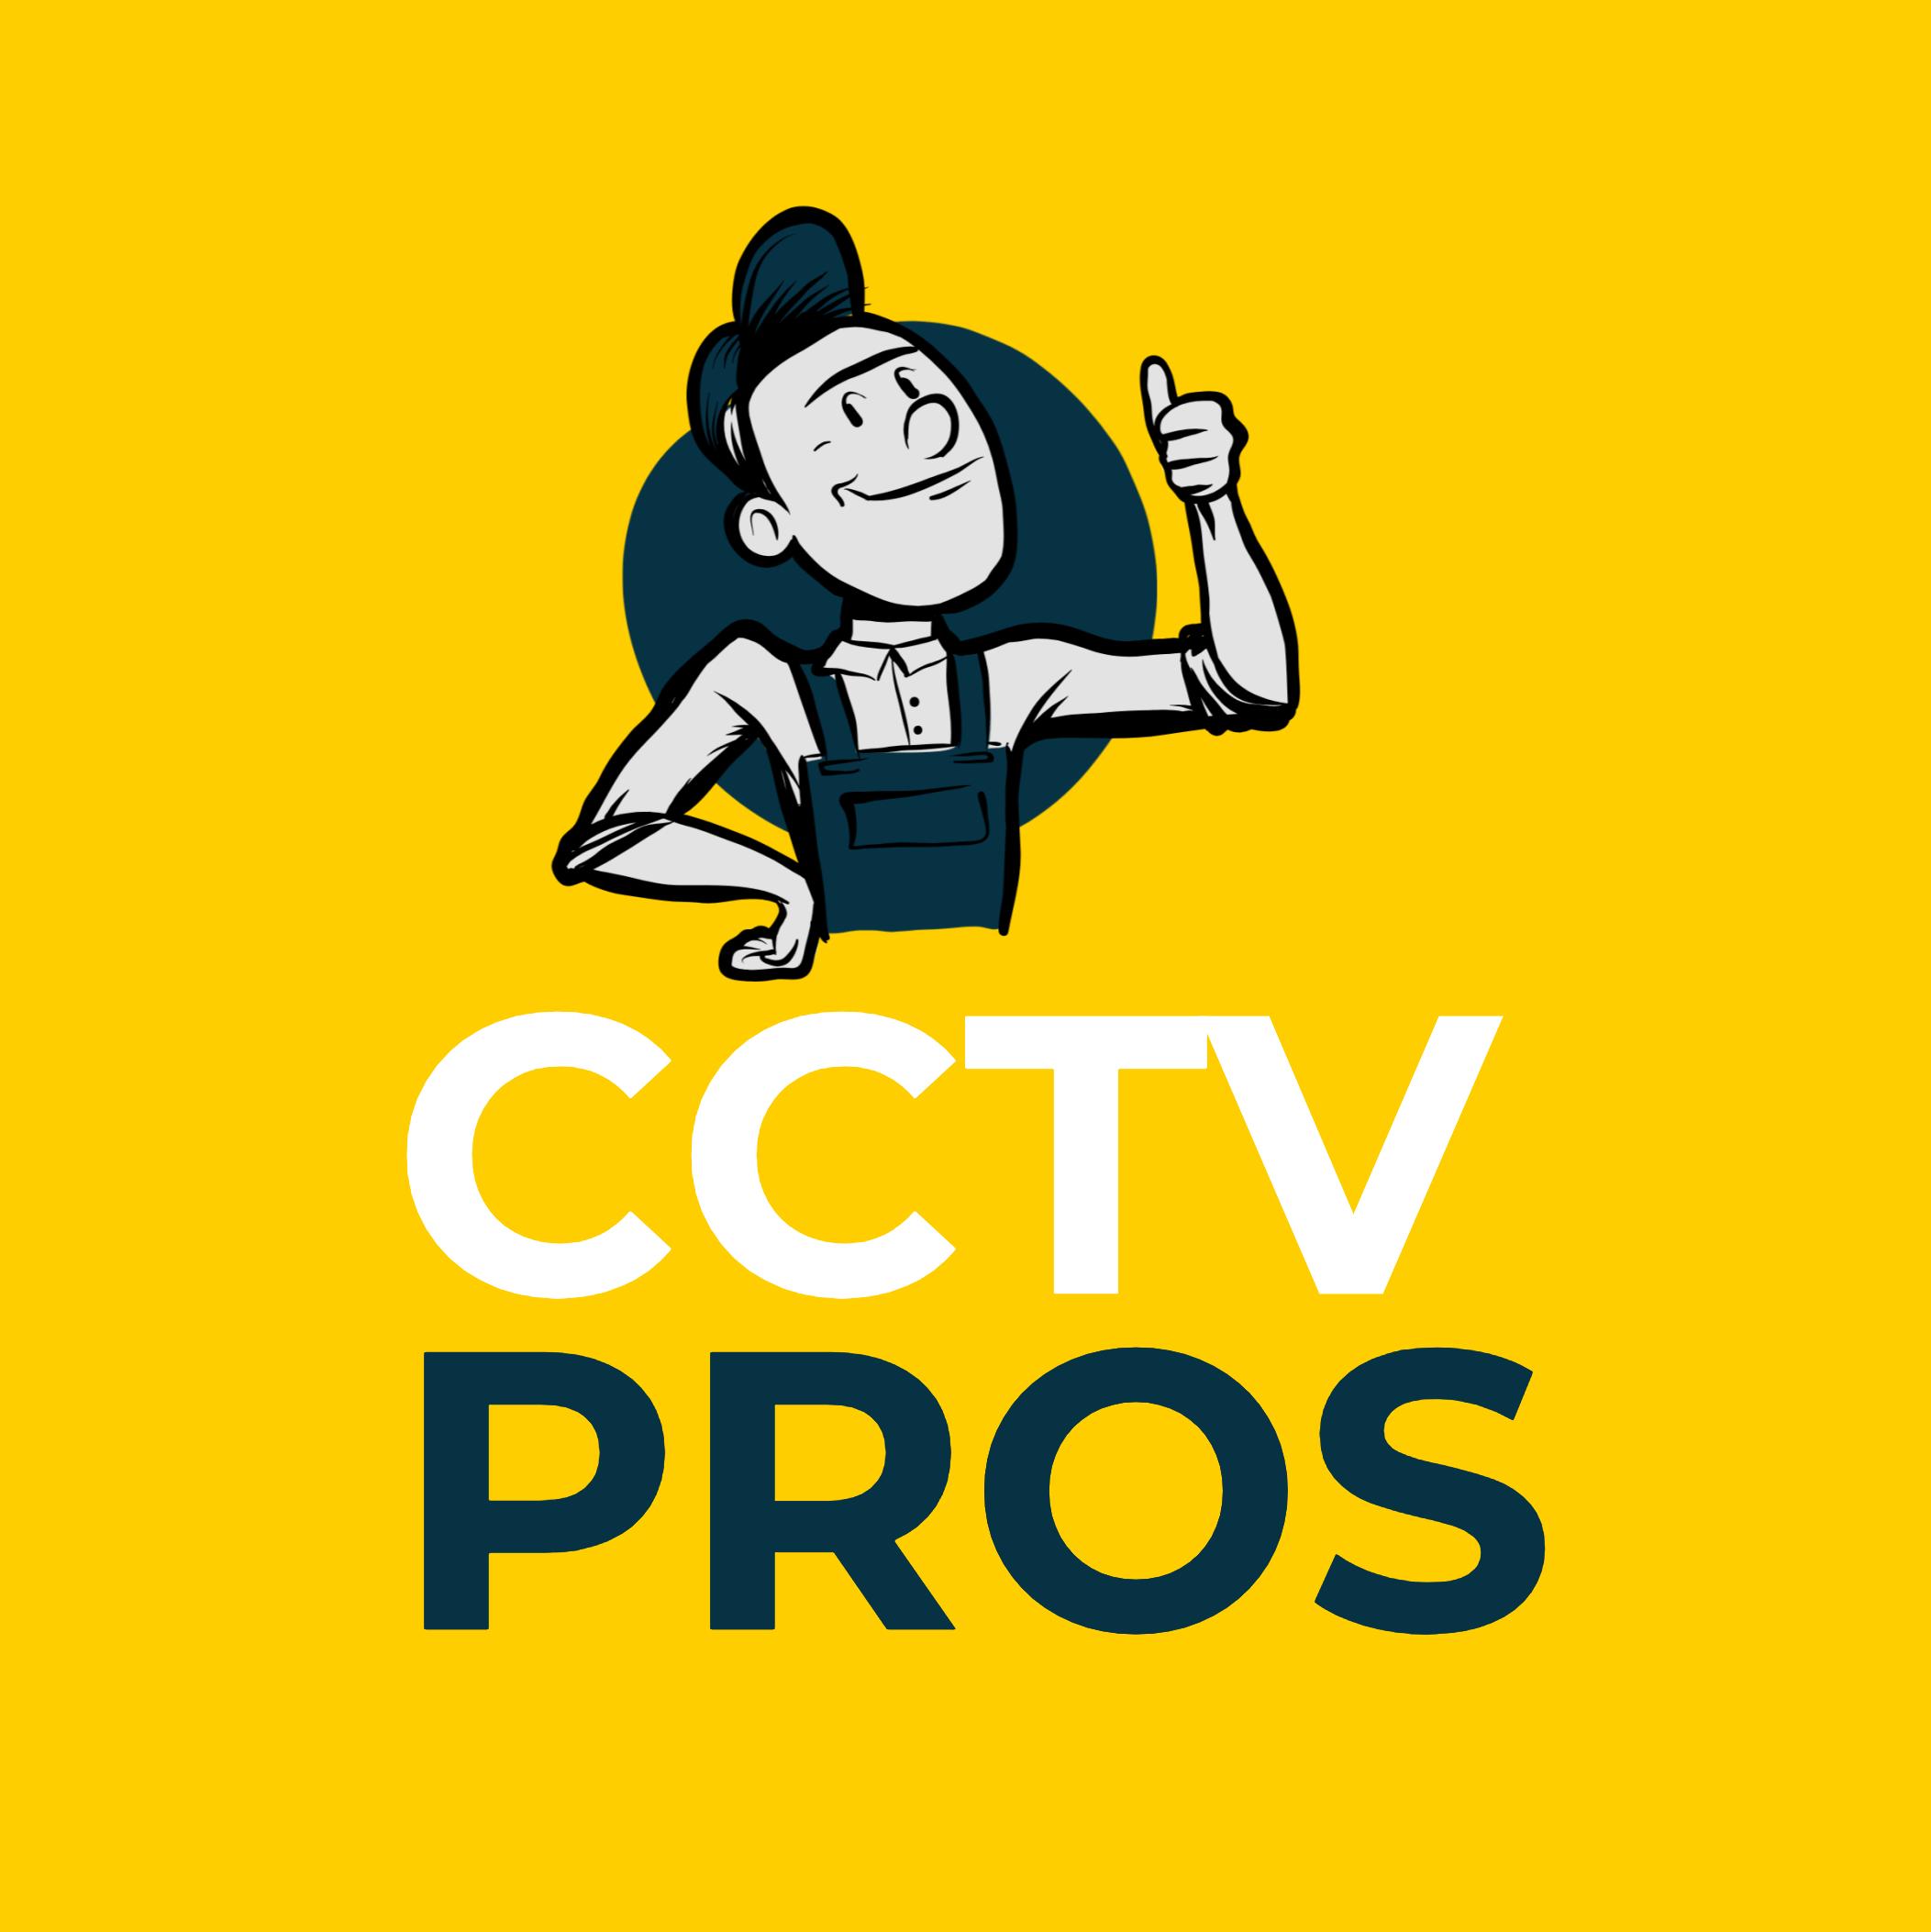 CCTV Pros – CCTV Pros Square- Yellow BG